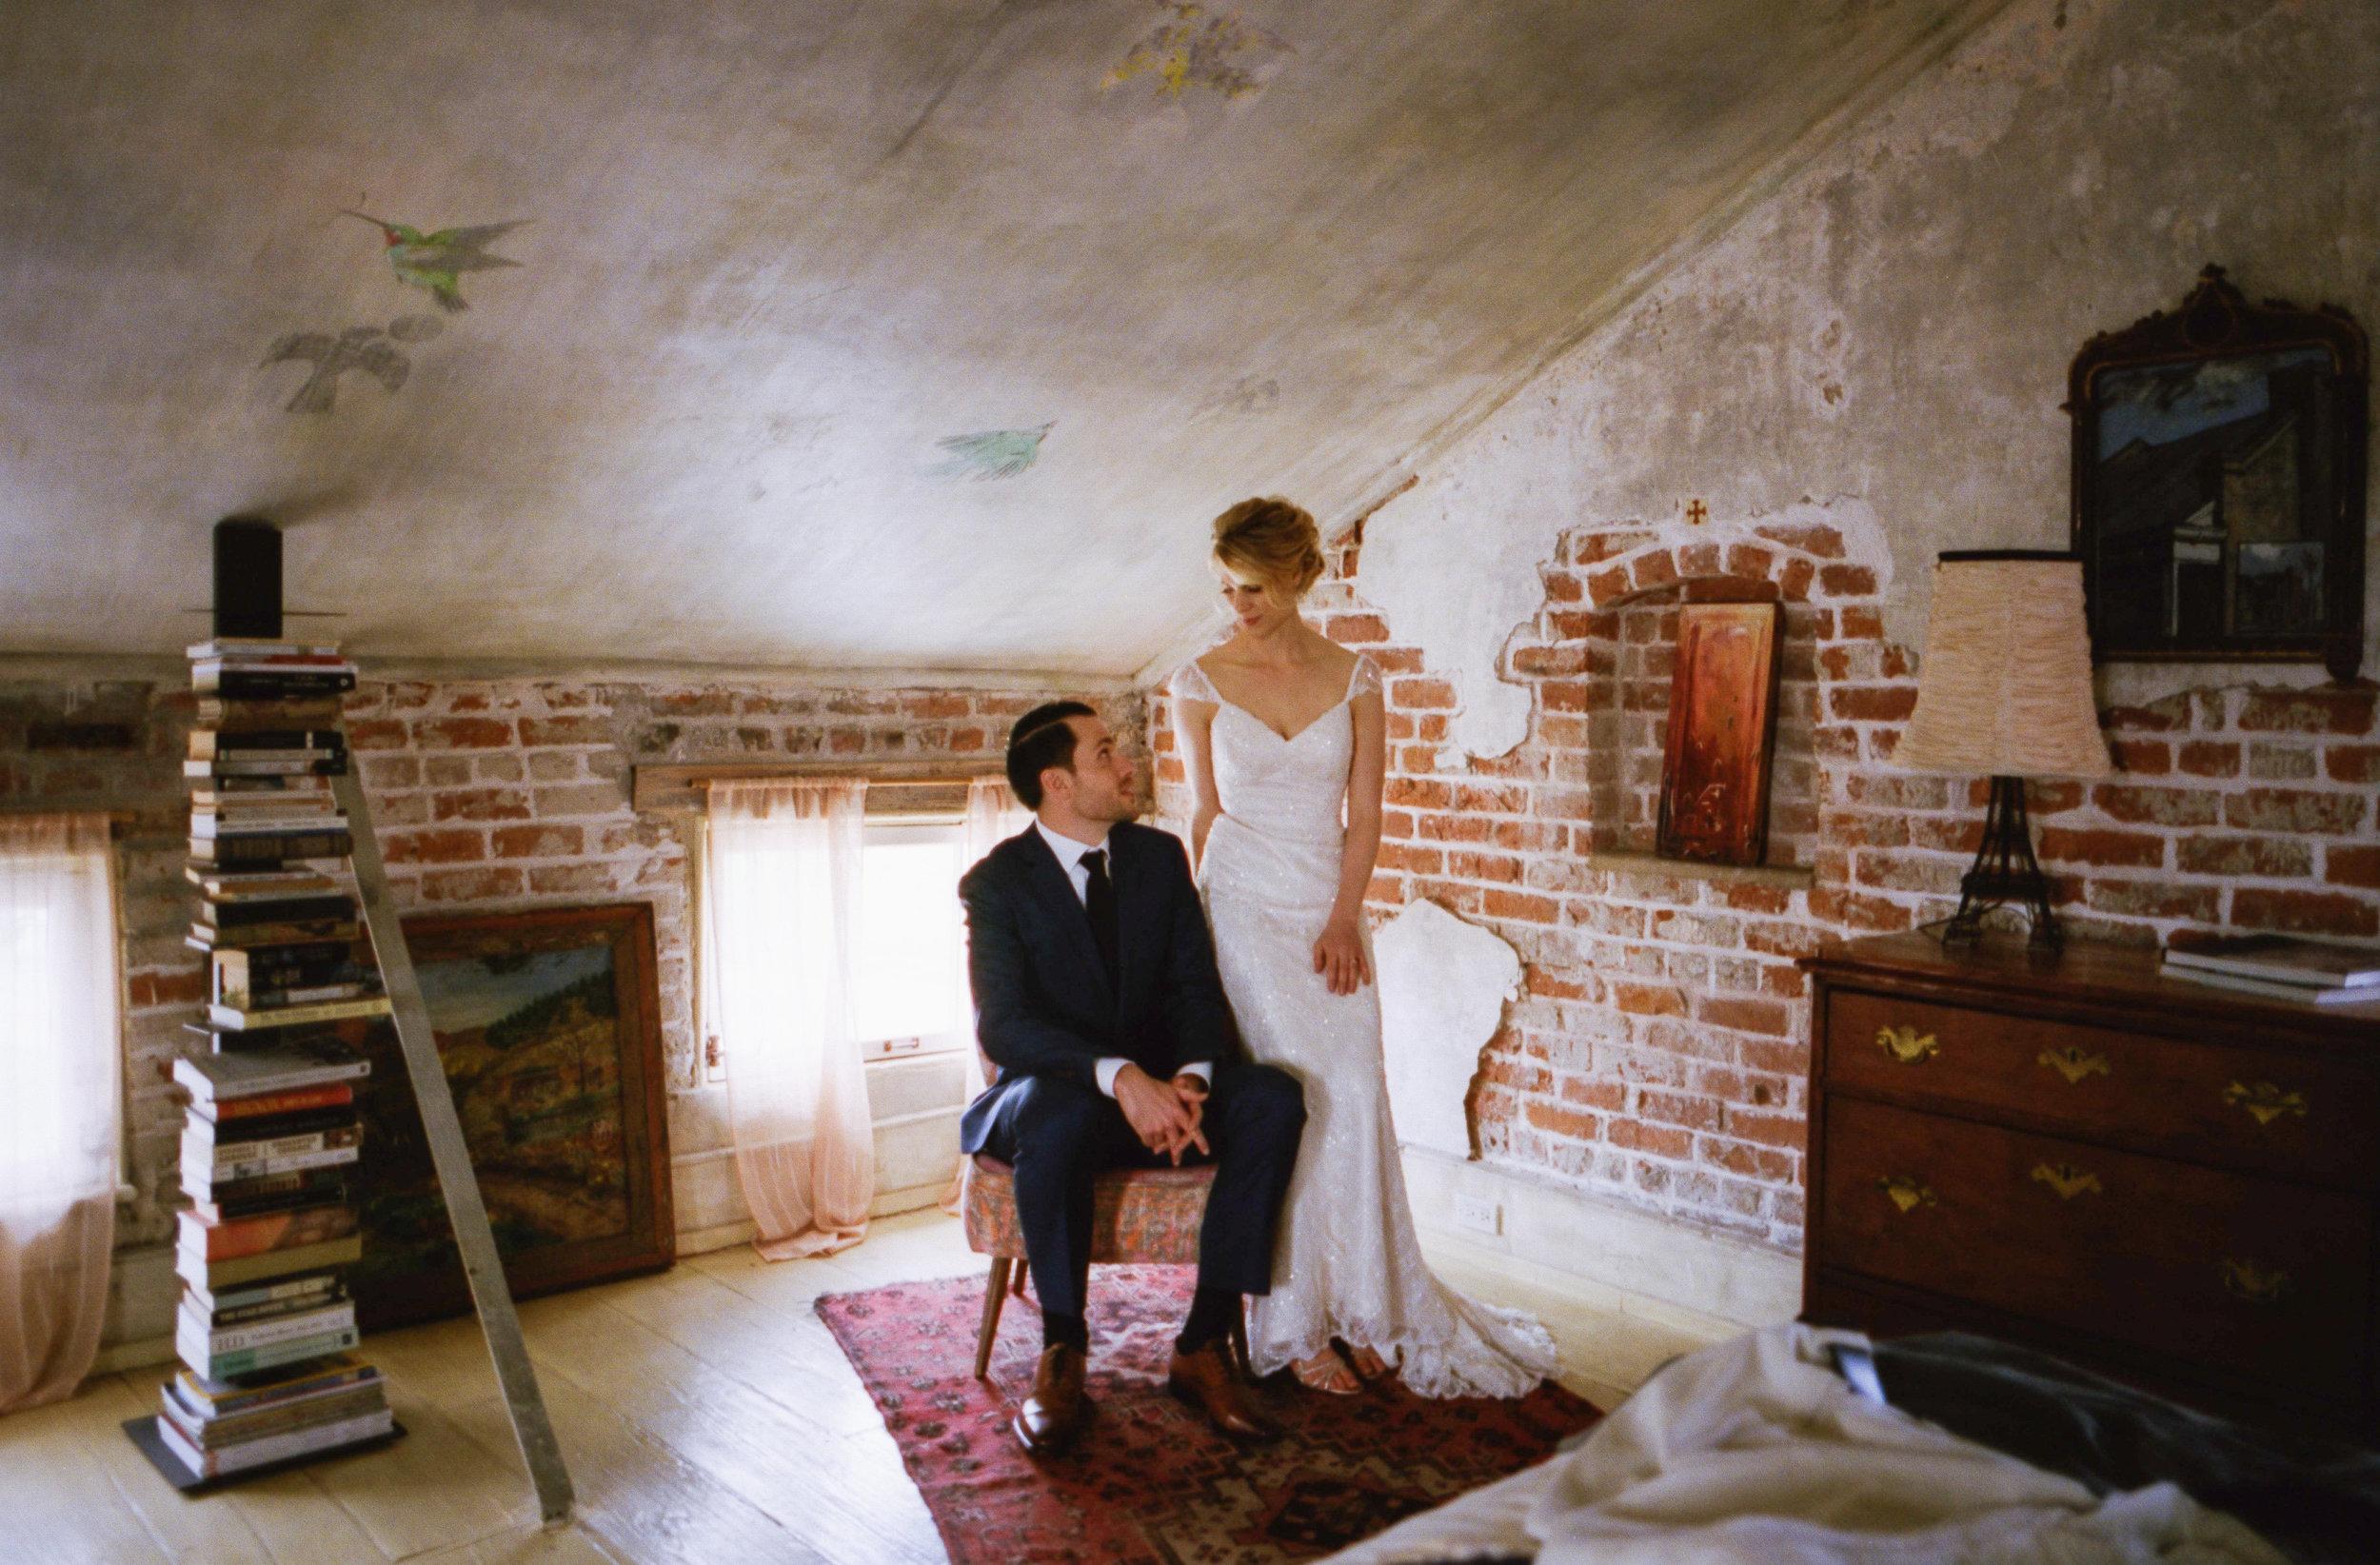 portra_400_film_wedding_chellise_michael_photography-28.jpg